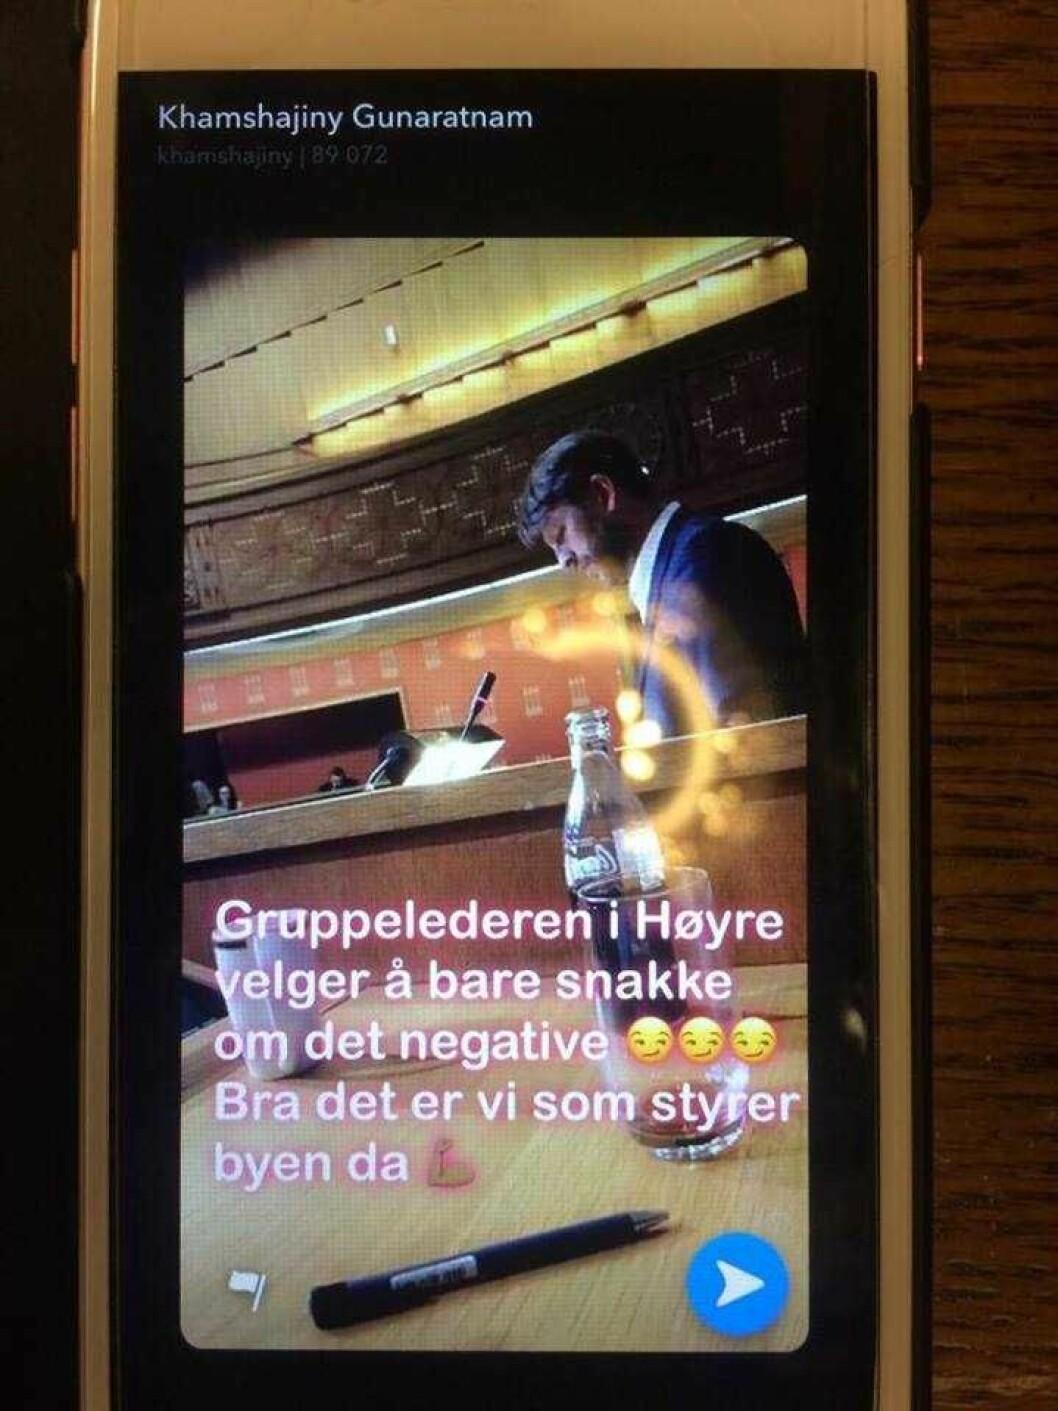 Varaordføreren i Oslo, Khamsy Gunaratnam (Ap), tar bilde og skriver teksten mens hun sitter ved møtelederbordet under bystyremøtet sist onsdag. Eirk Lae Solberg står på talerstolen en drøy meter unna. Foto: Privat